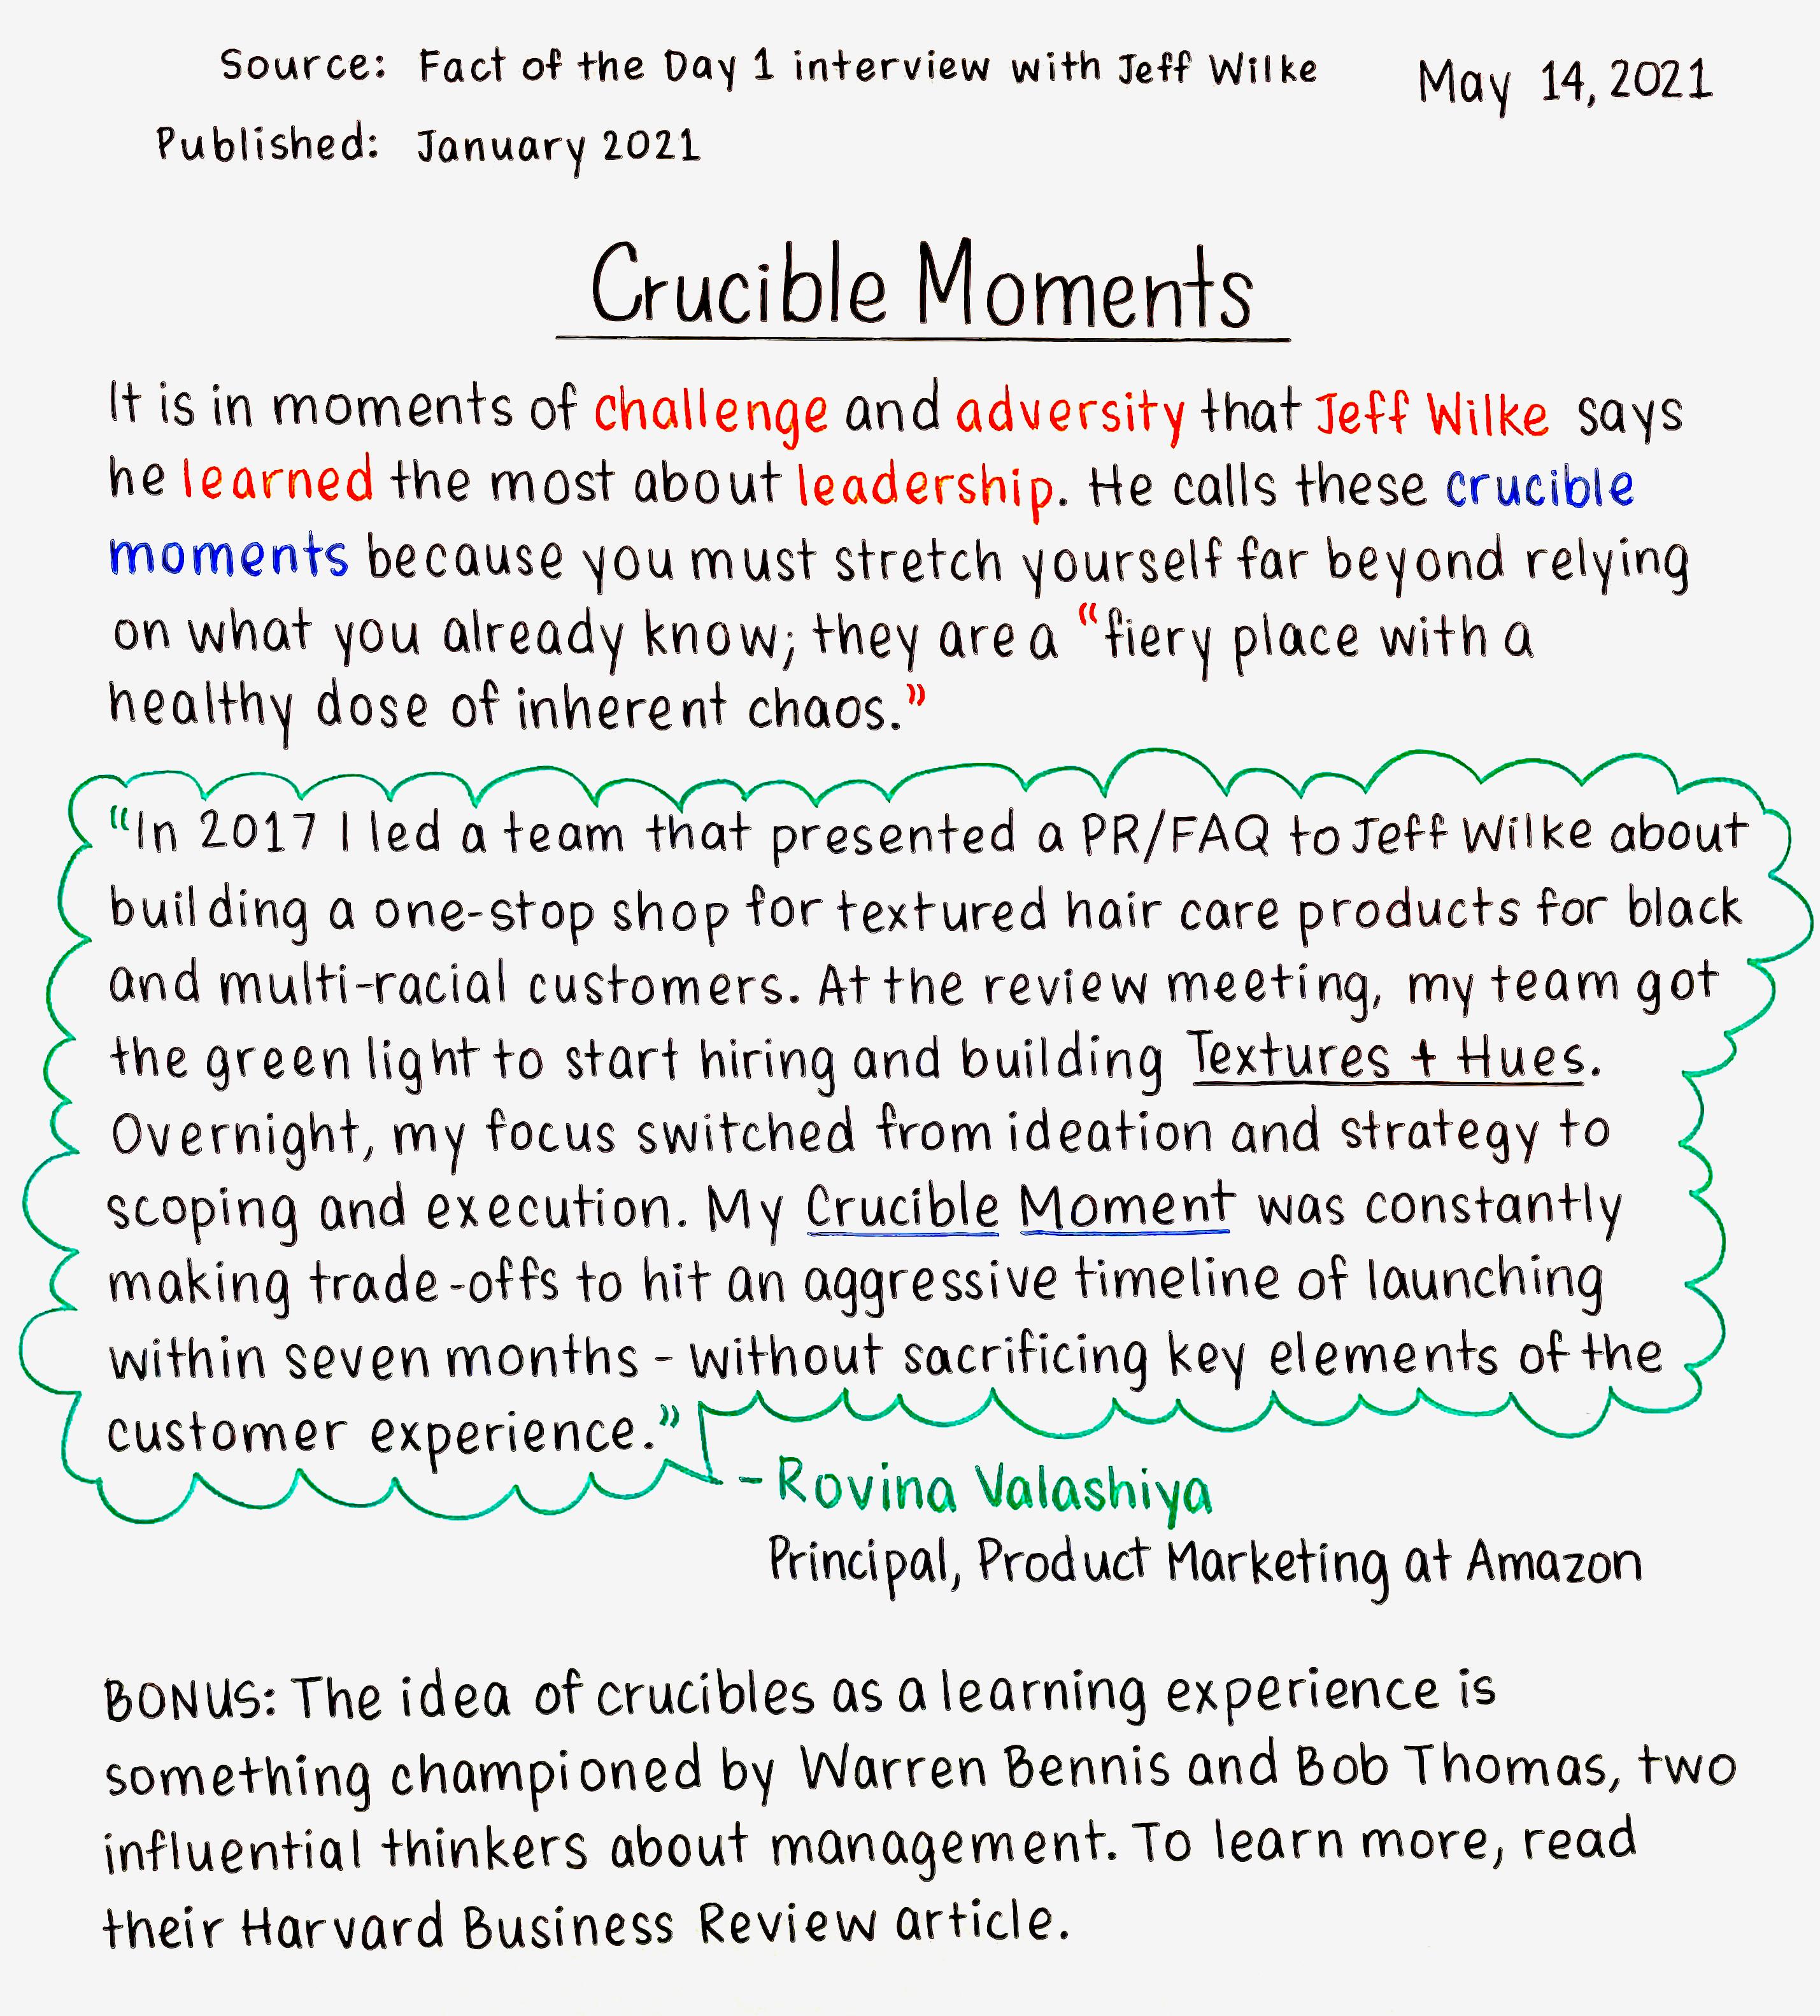 Crucible Moments